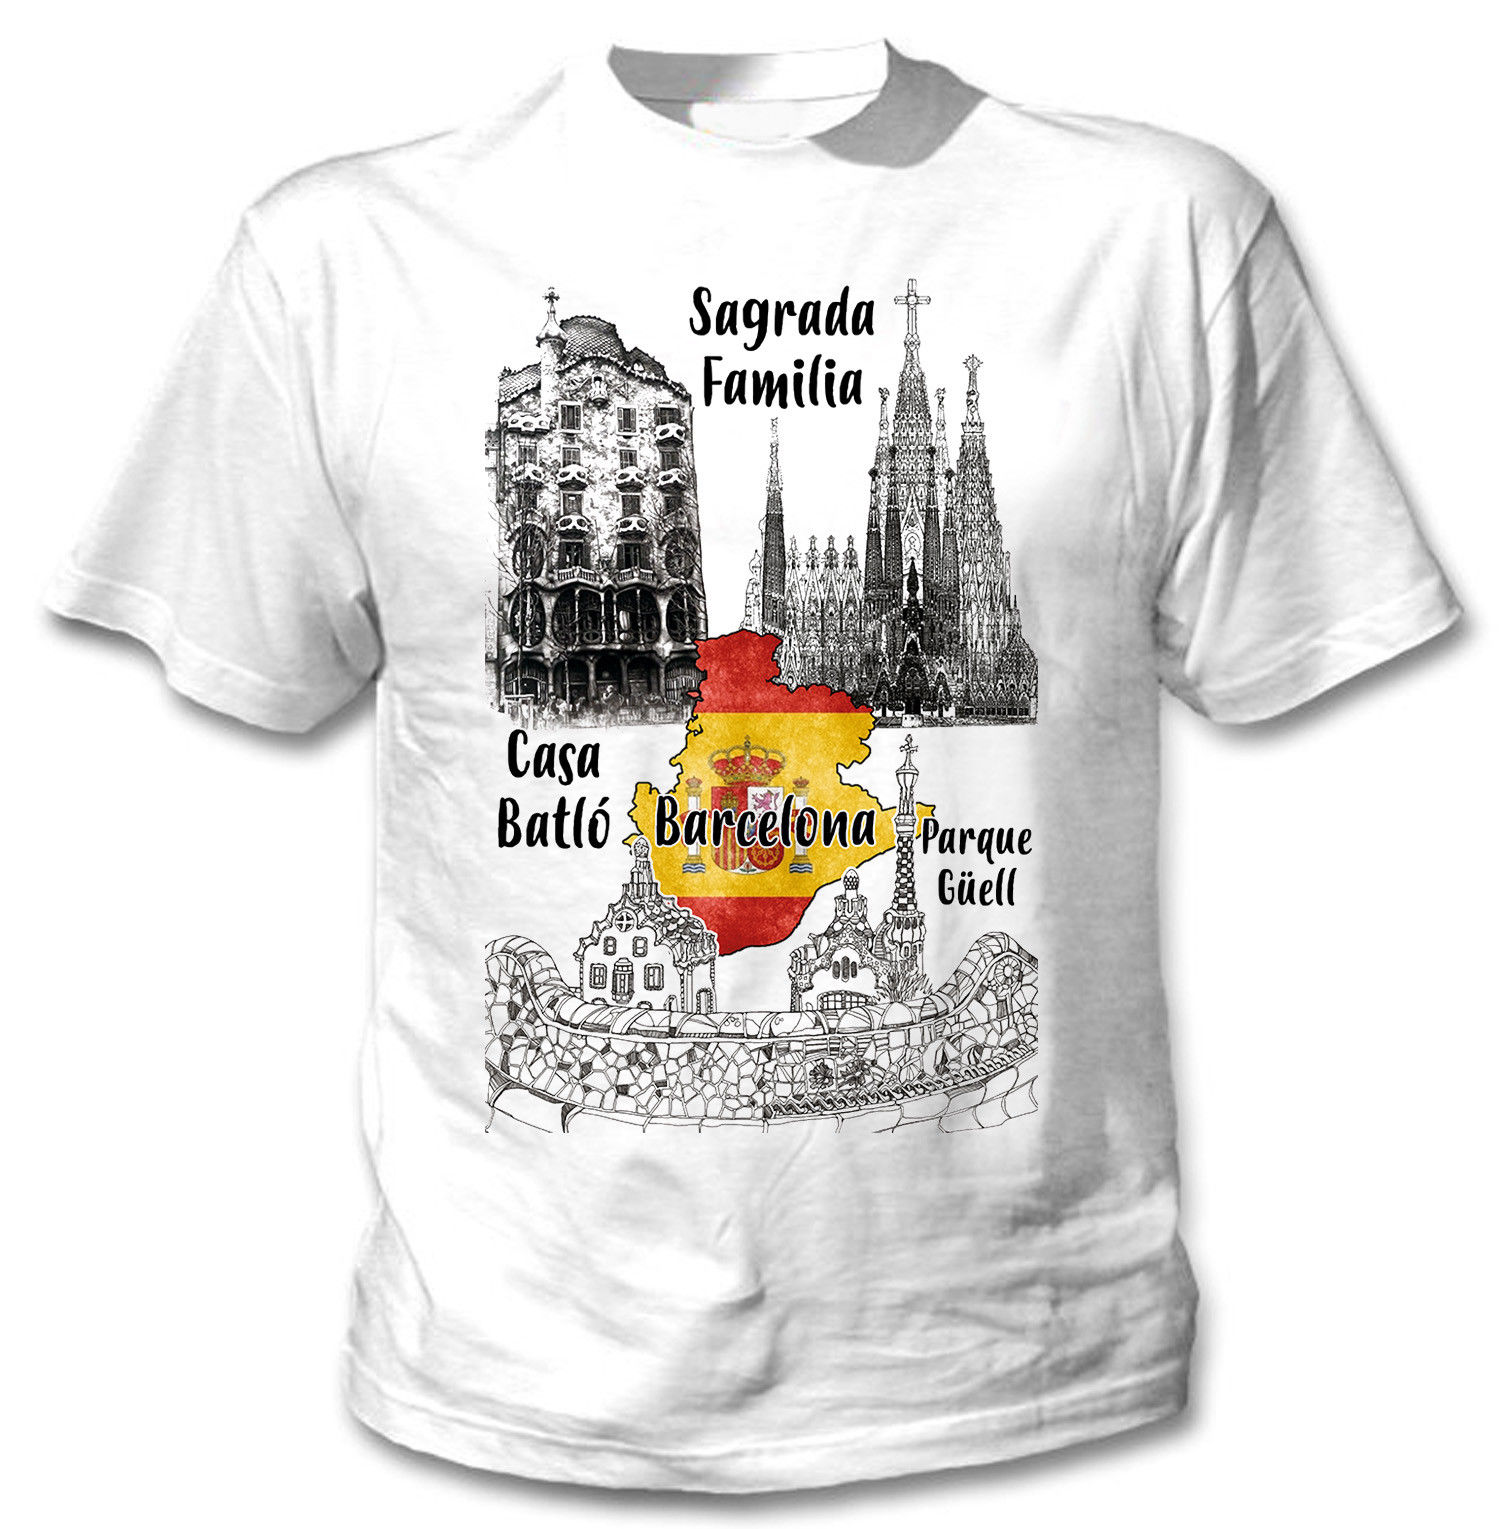 bea01c25a 2018-Men-T-Shirt-Fashion-BARCELONA-SPAIN-NEW-COTTON-WHITE-TSHIRT-Tee-shirt .jpg